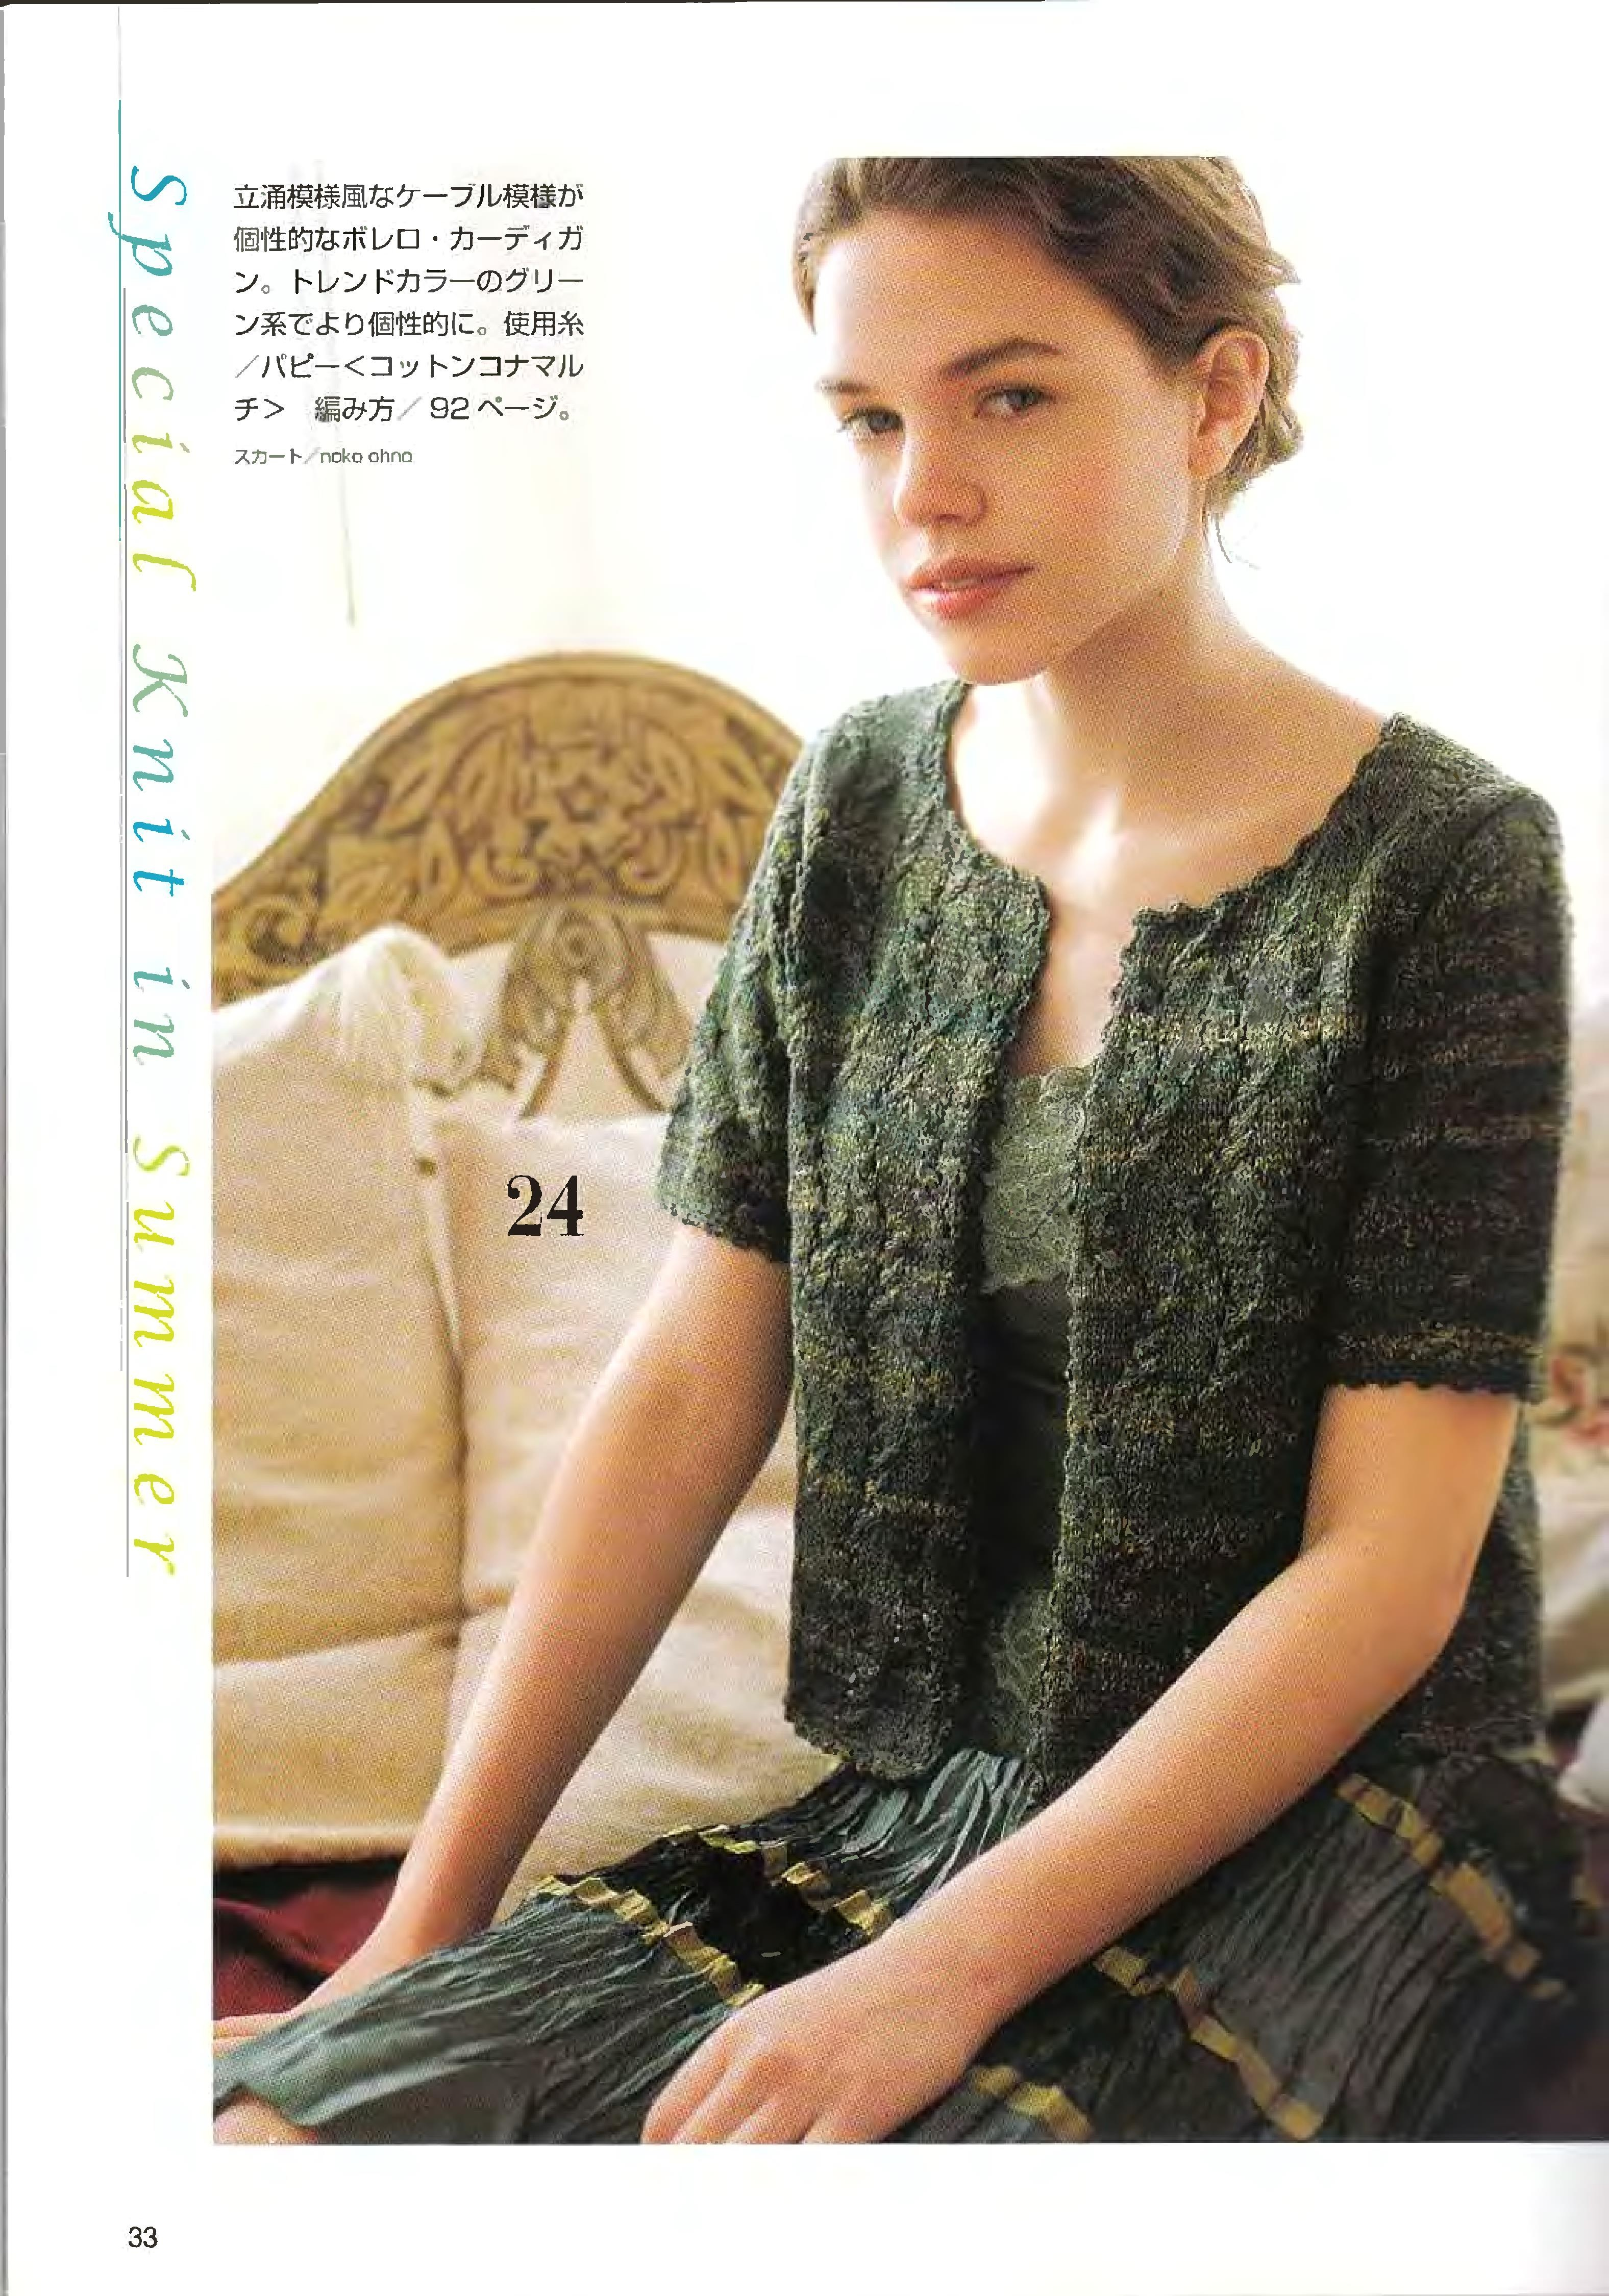 Lets-knit-series-NV4359-2008-Spring-Summer-sp-kr_31.jpg